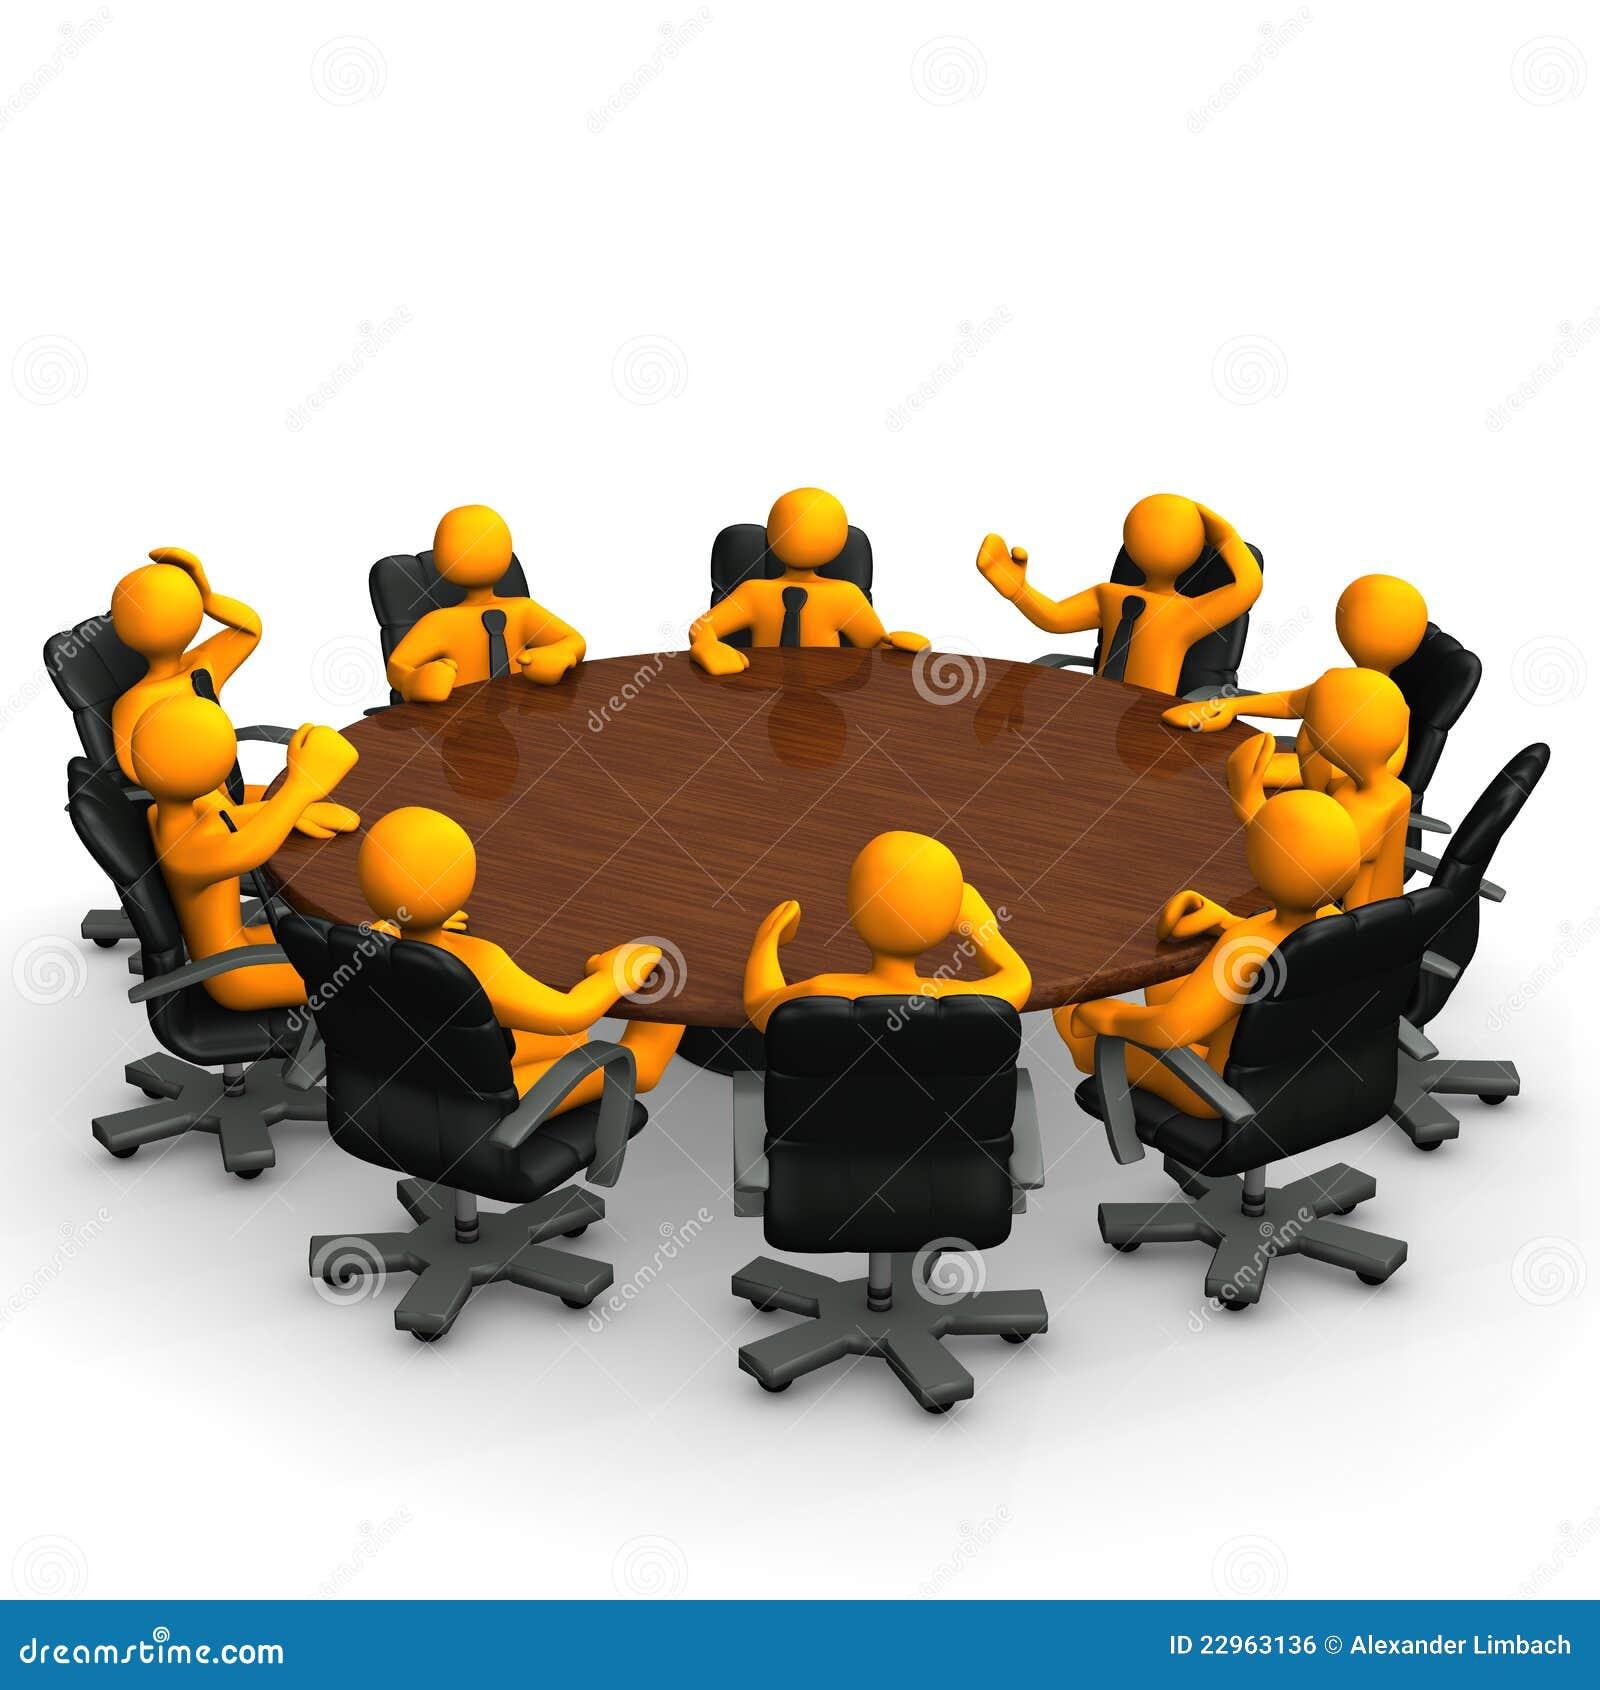 Mesa de reuniones imagen de archivo libre de regal as for Mesa de reuniones